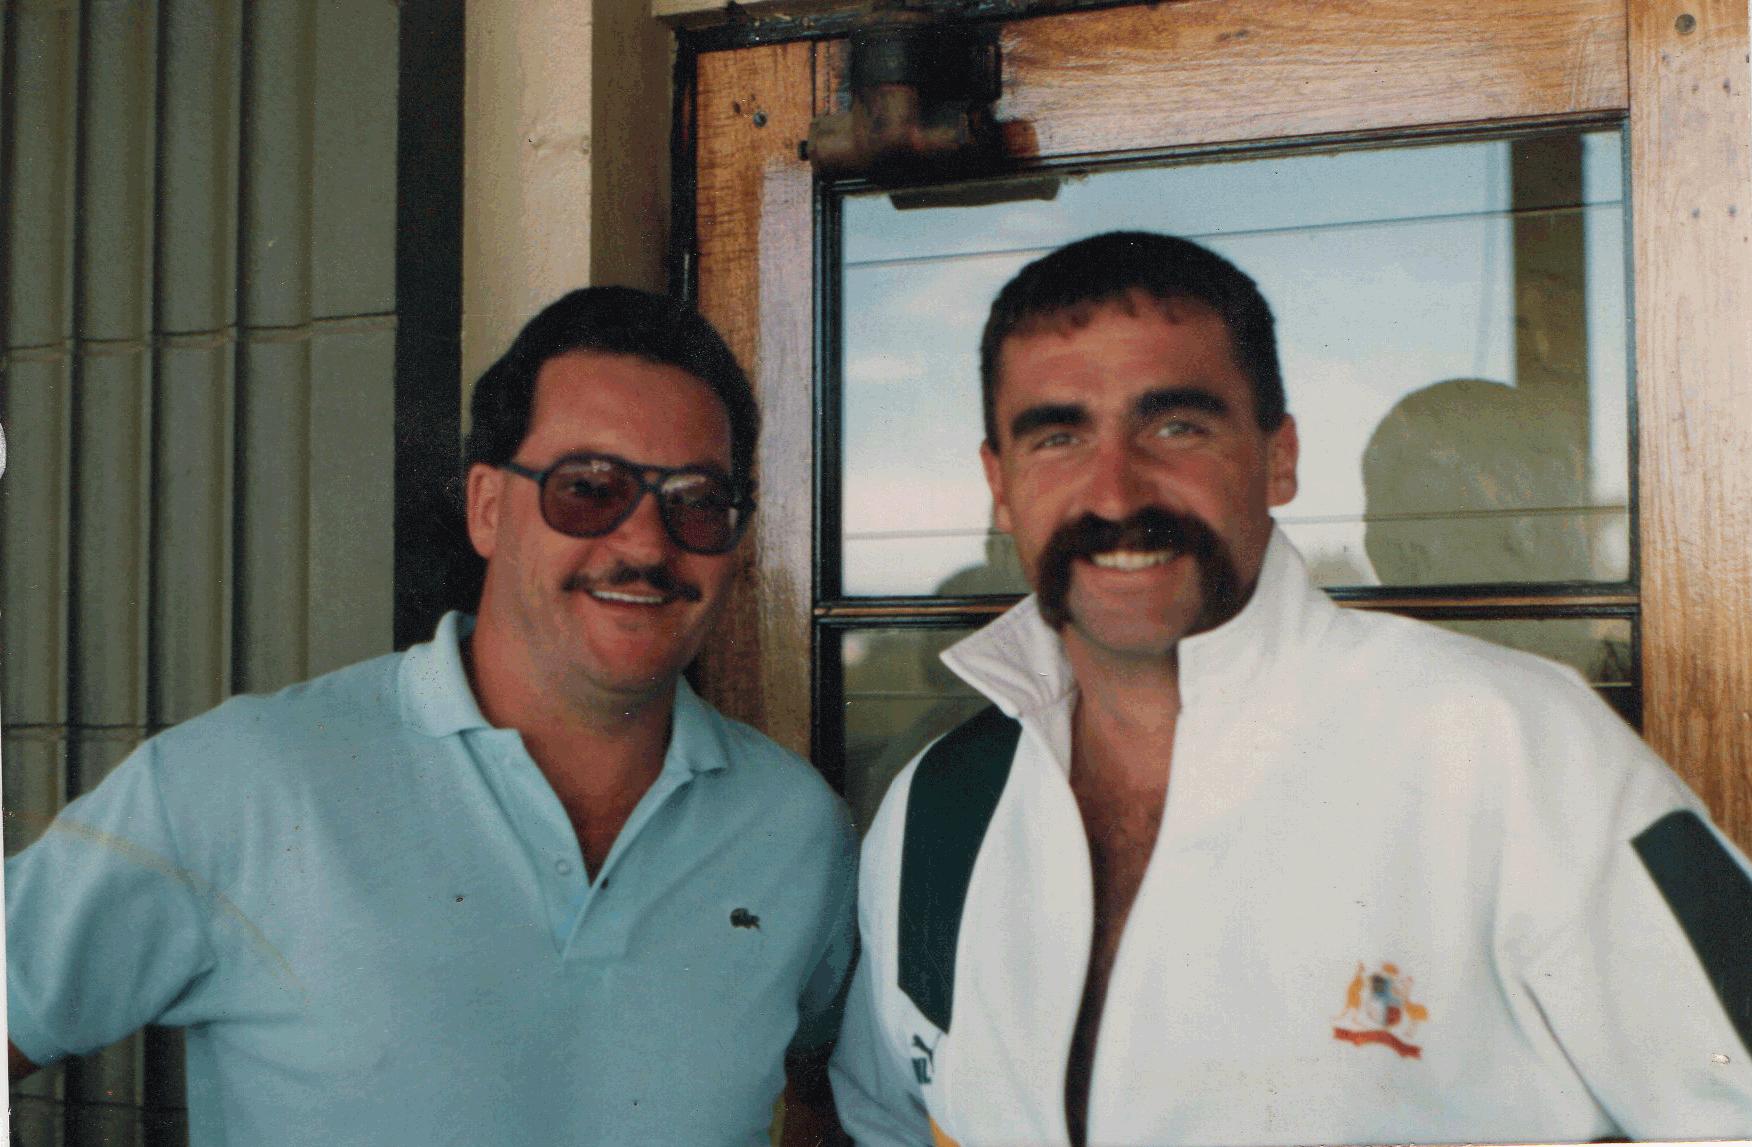 Steve Remfry & Merv Hughes